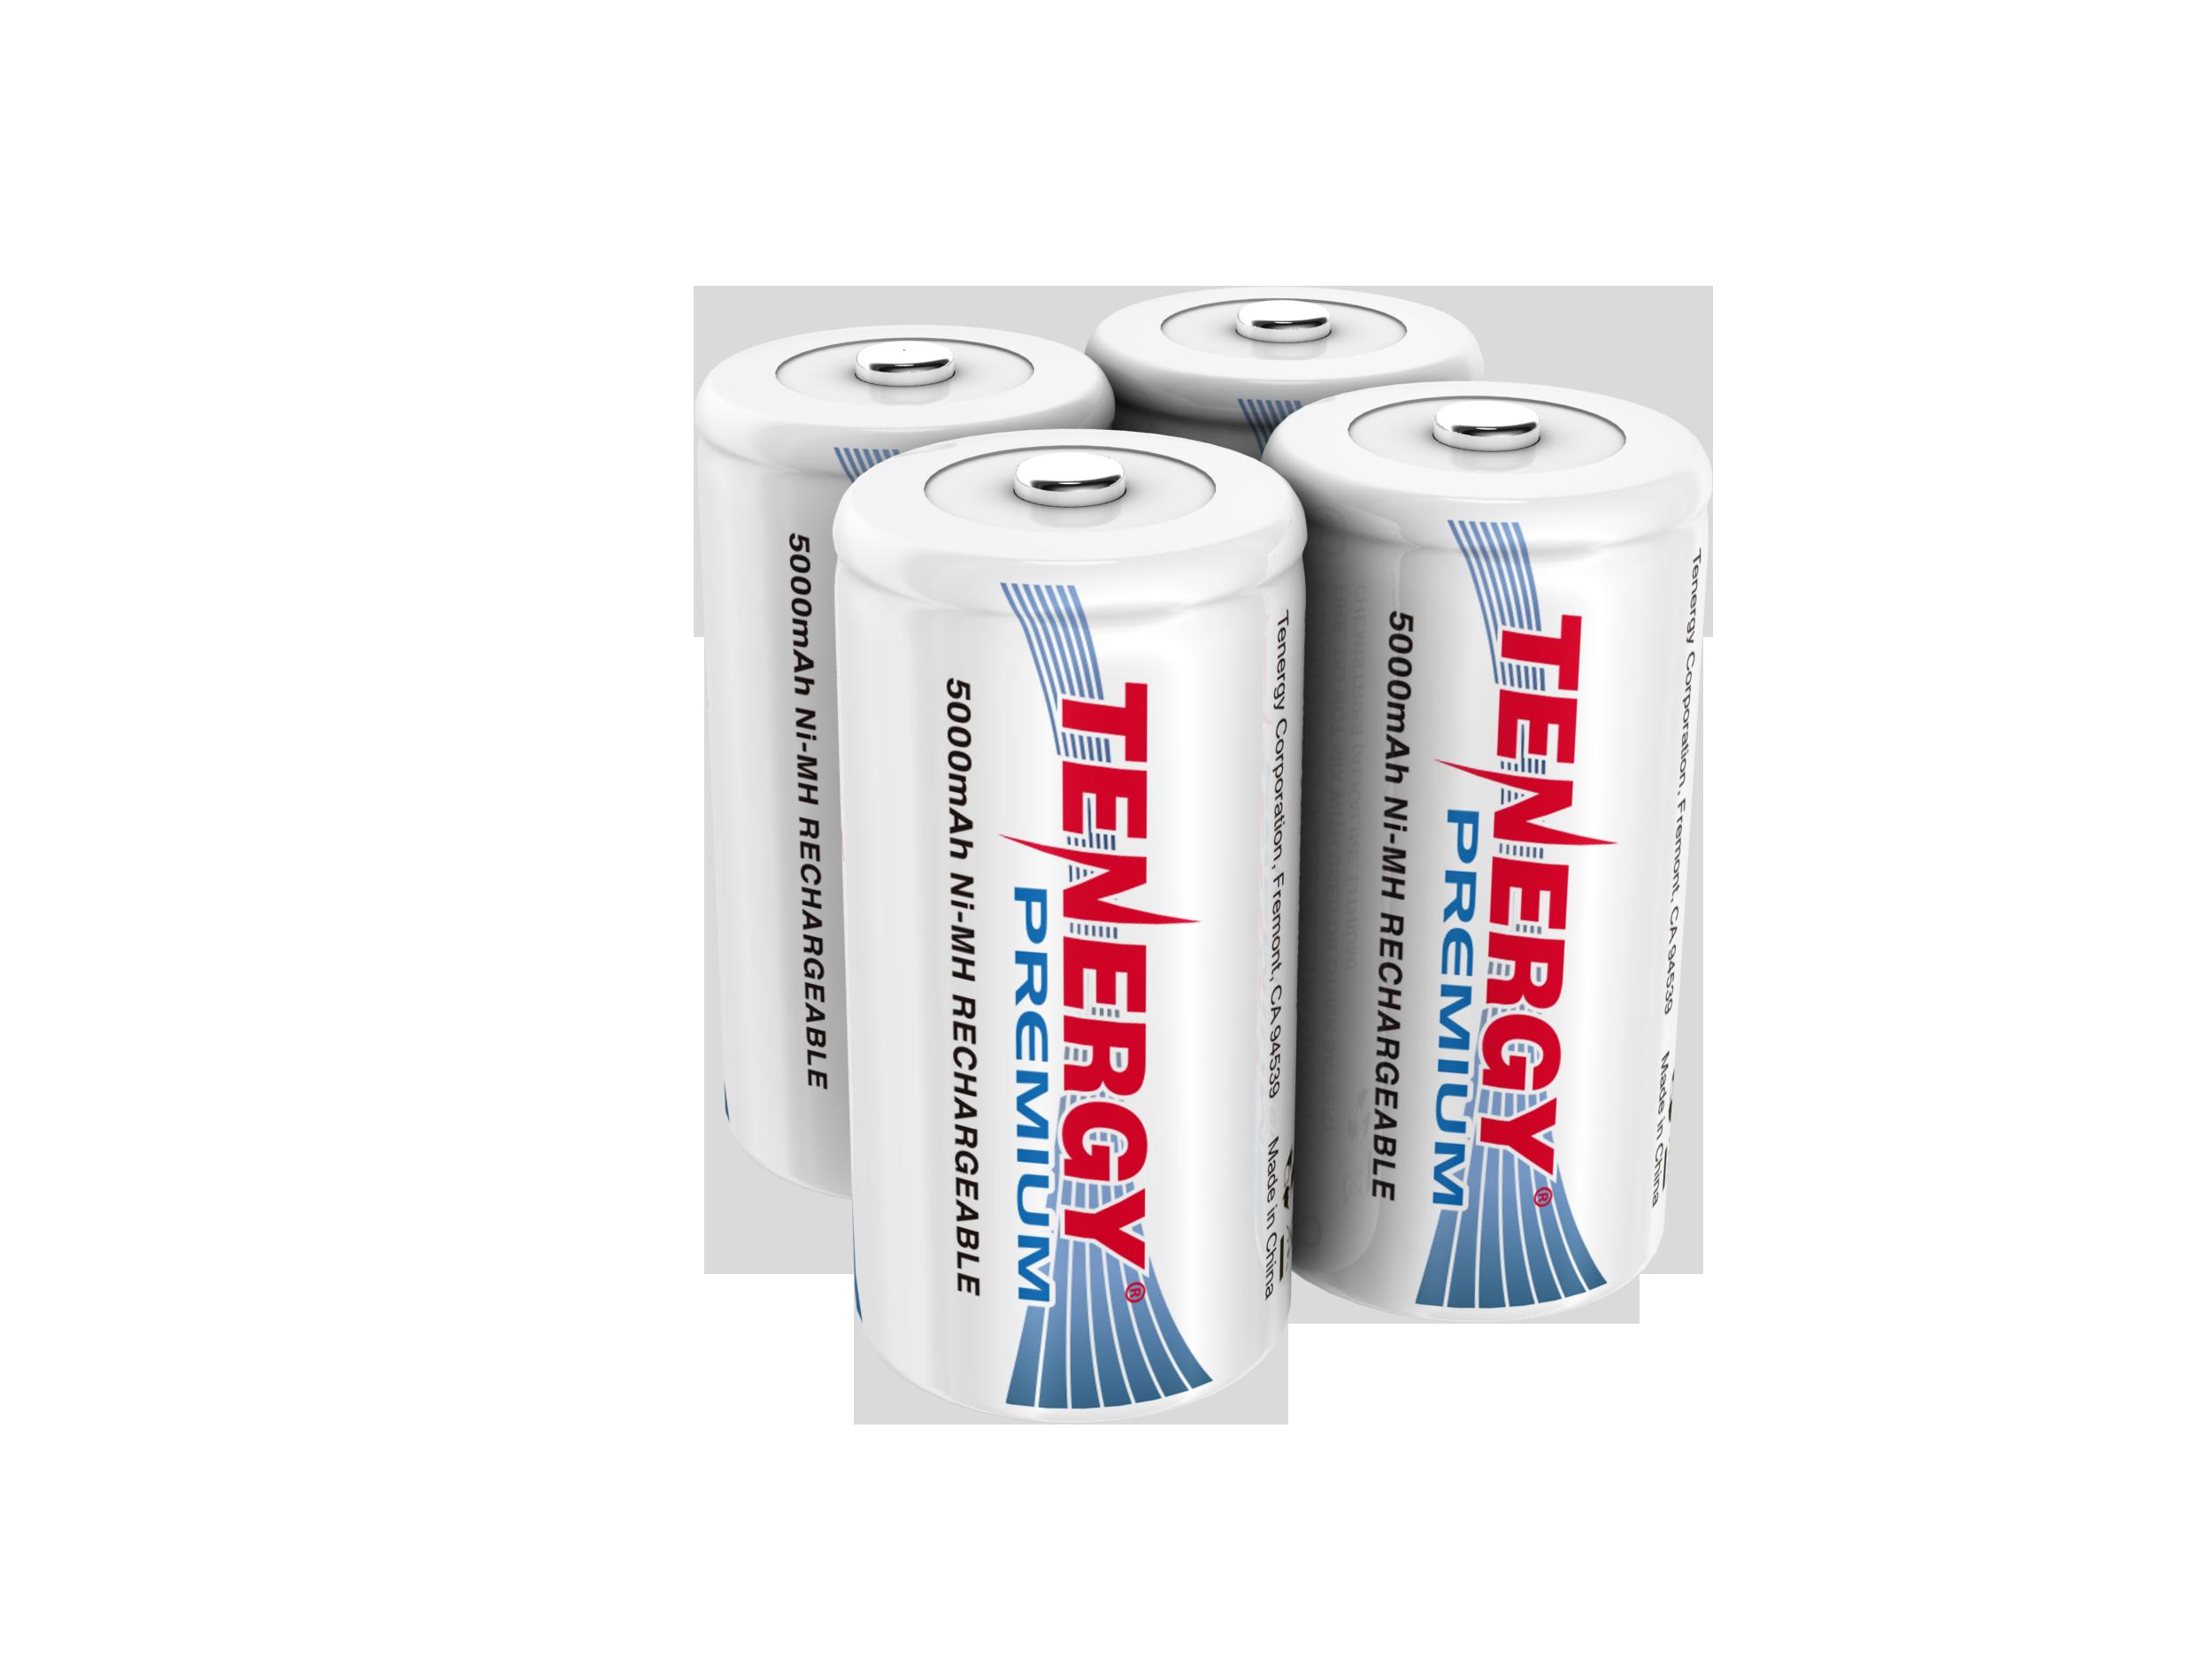 Combo 4 Pcs Tenergy Premium C 5000mah Nimh Rechargeable Batteries Rechargeable Batteries Nimh Household Batteries